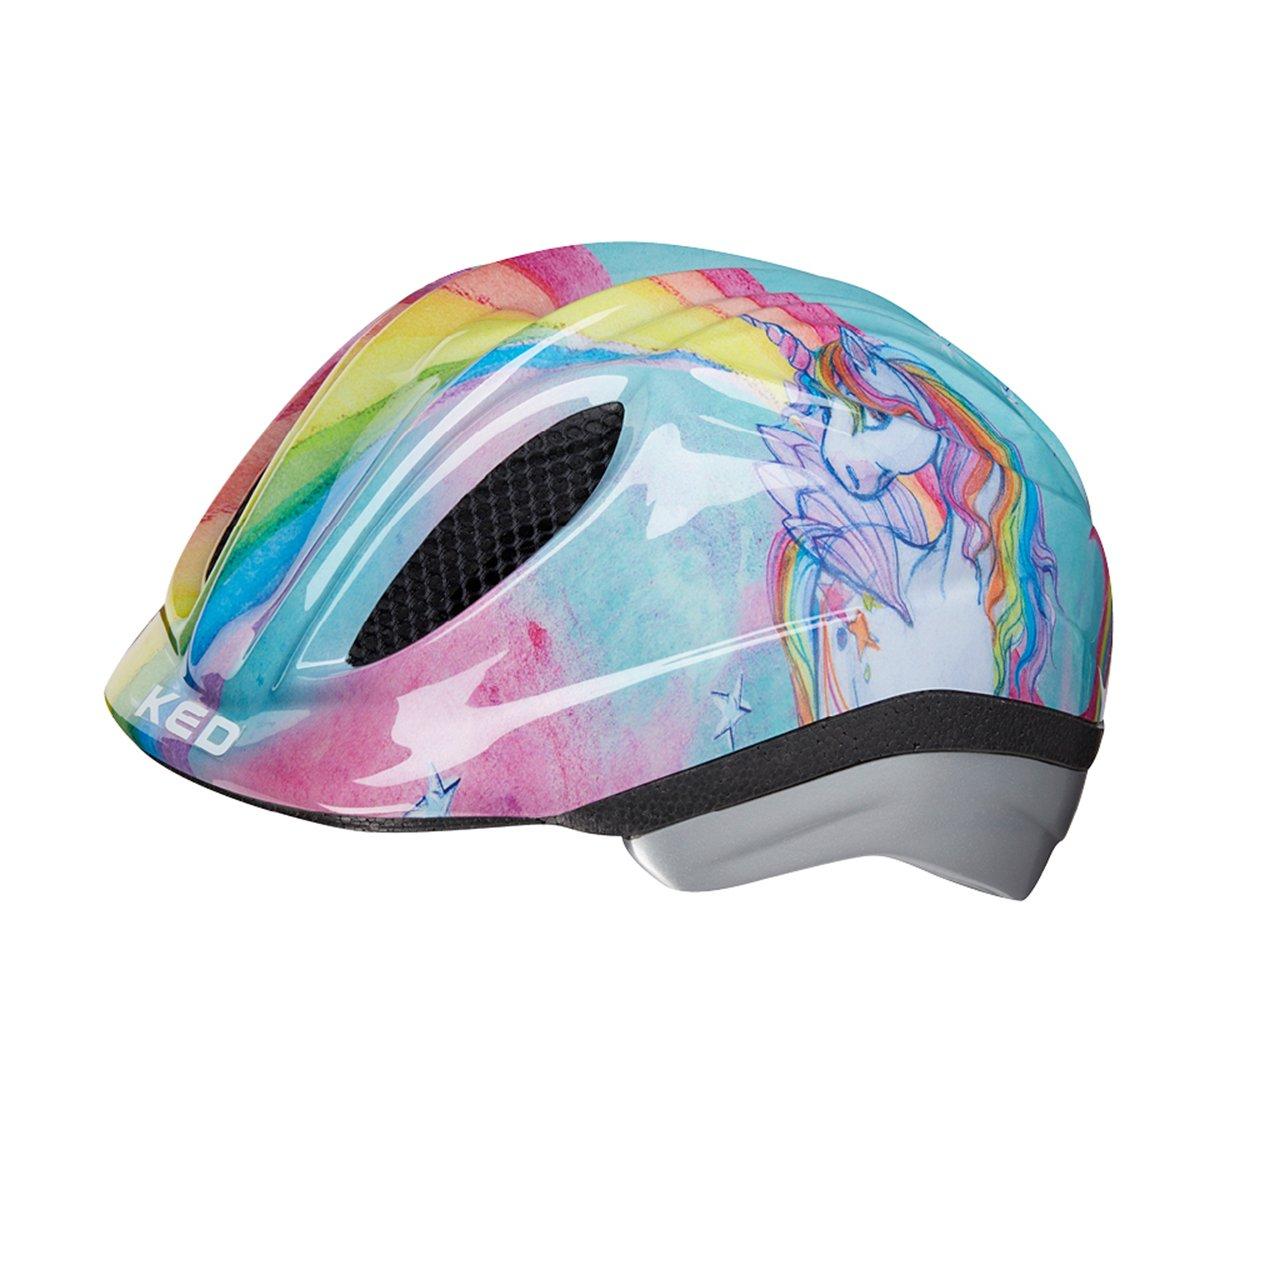 KED Meggy II Originals Helmet Kids Unicornio paraíso tamaño de la cabeza s, 46 – 51 cm 2018